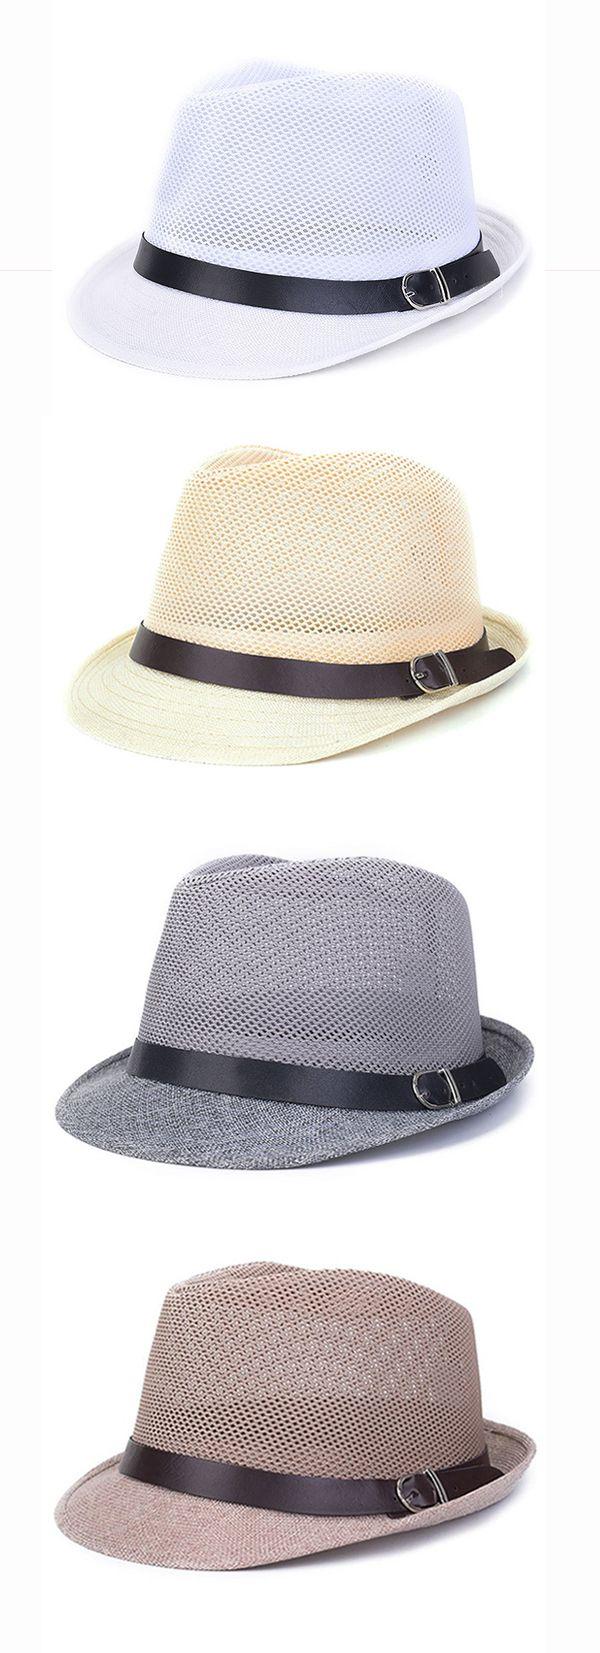 US$6.99 (45% OFF) Men&Women Hollow Out Mesh Top Hat /  Casual Braid Fedora Beach Sun Flax Panama Jazz Hat